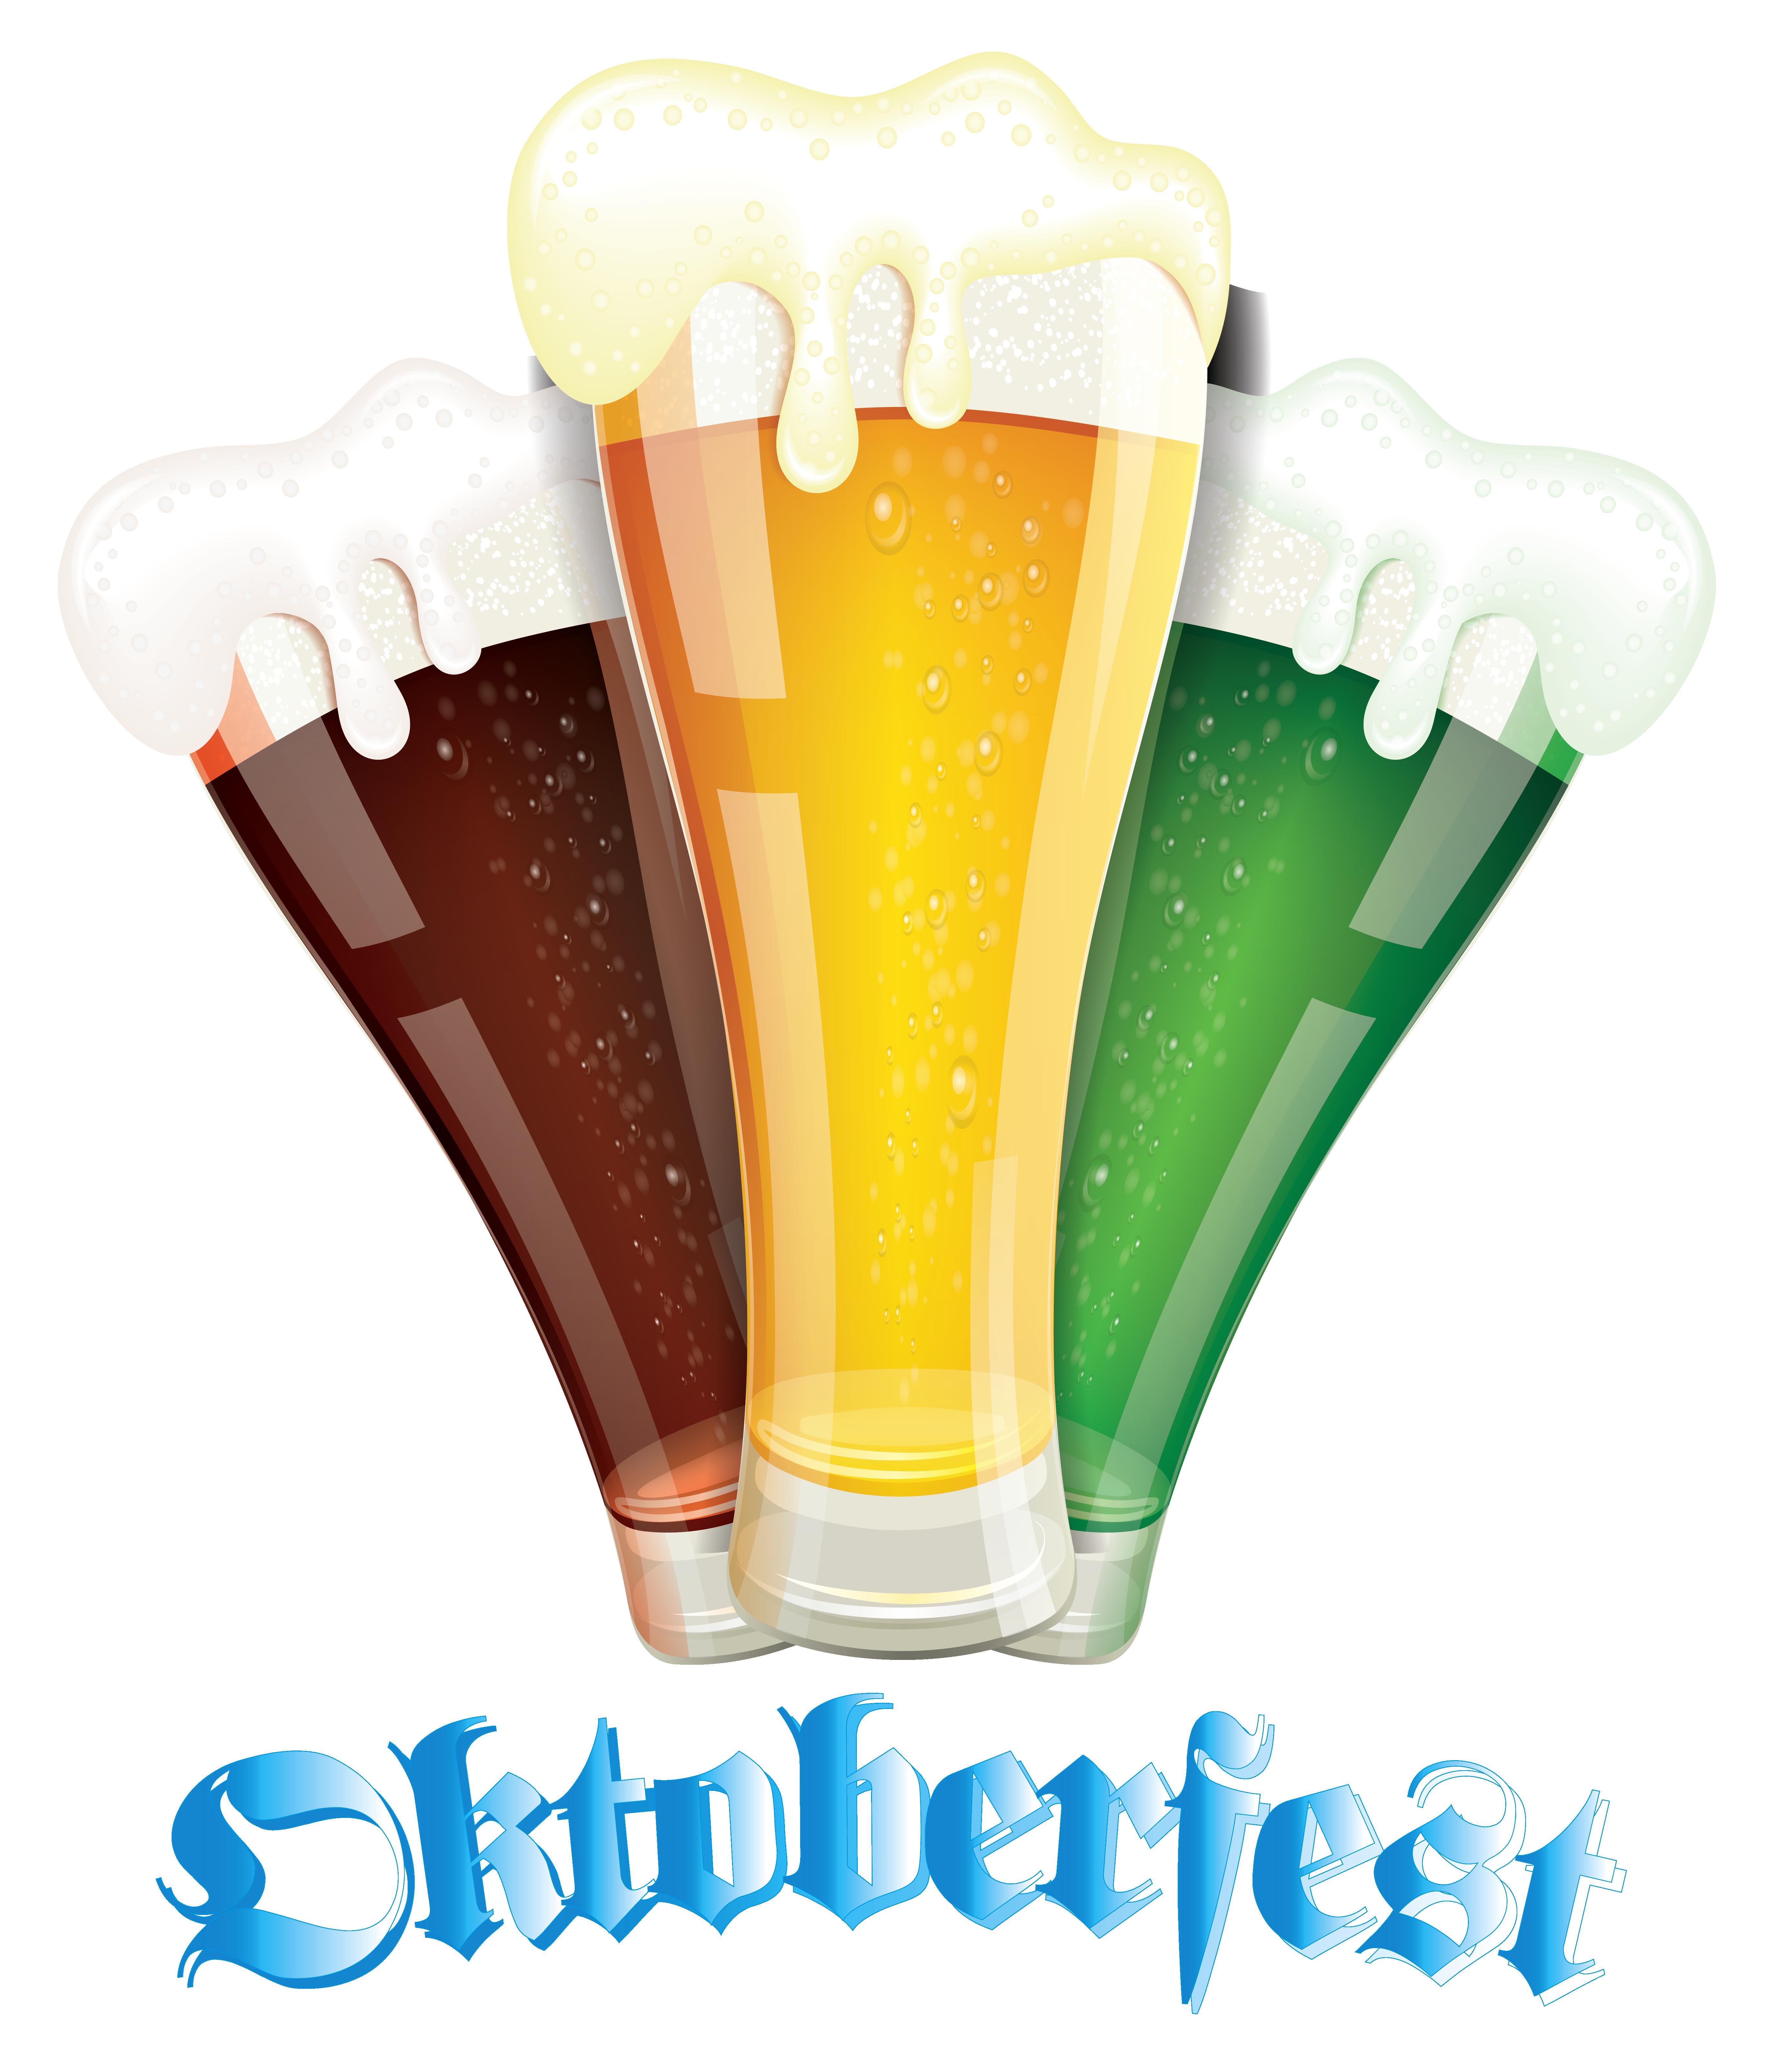 Oktoberfest clipart pilsner glass. Beers png image gallery